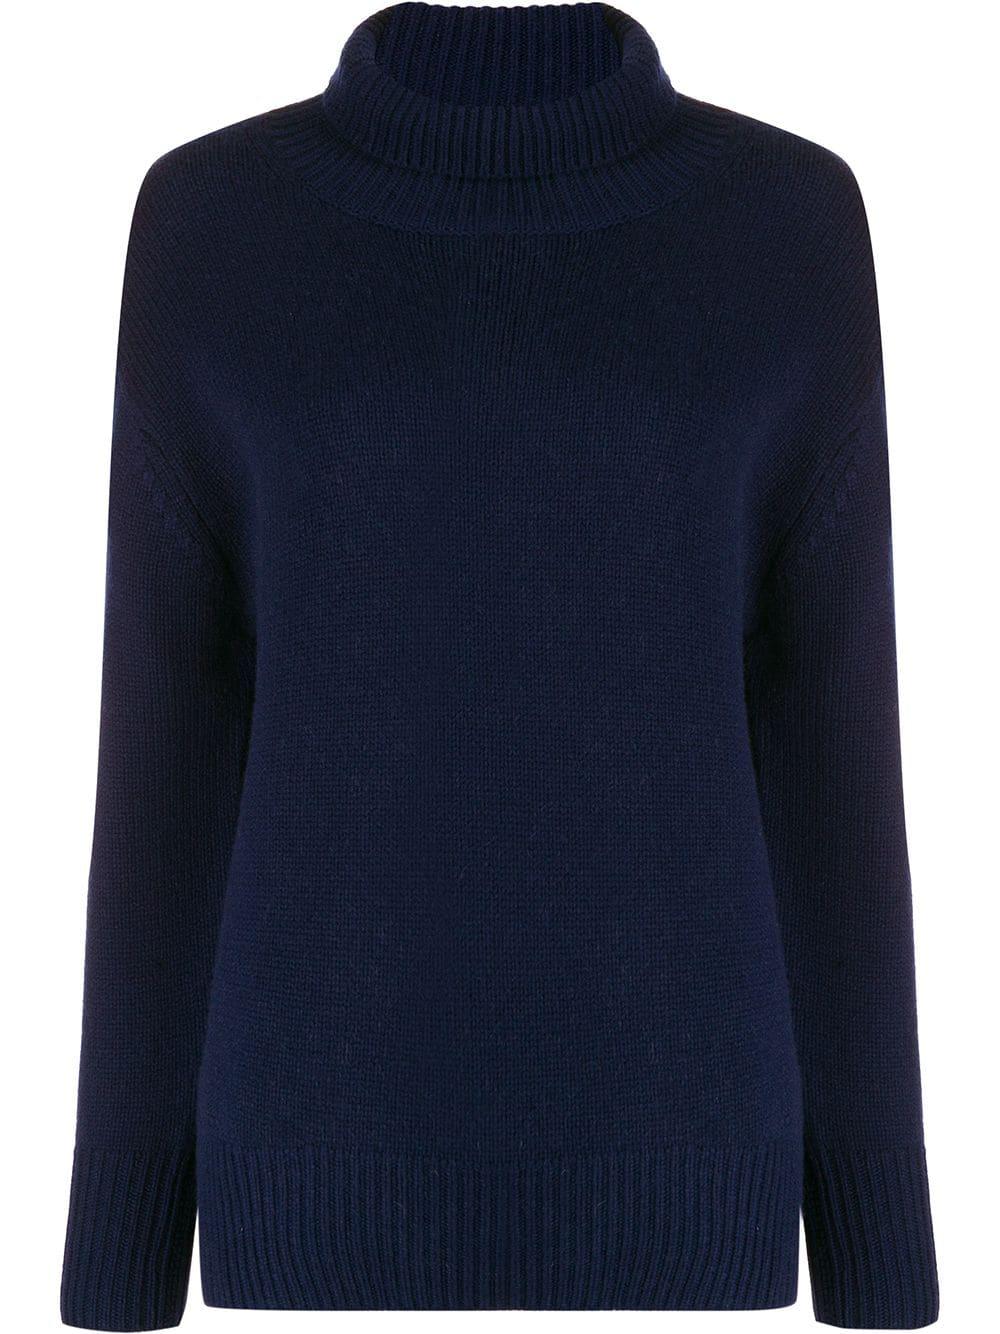 Tutleneck Sweater